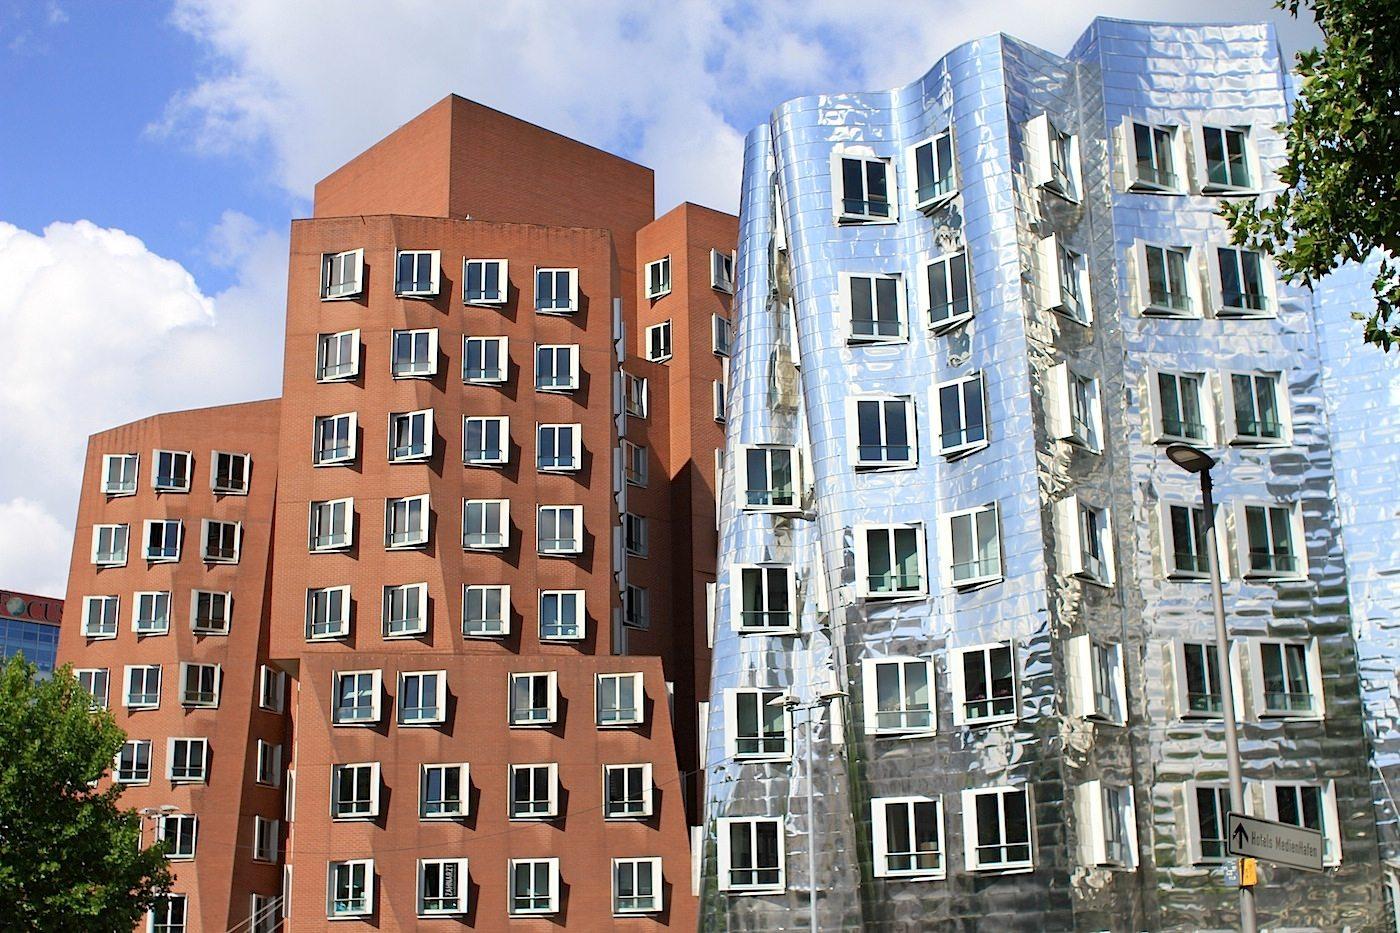 Neuer Zollhof 1–3.  House A: red brick, house B: stainless steel.